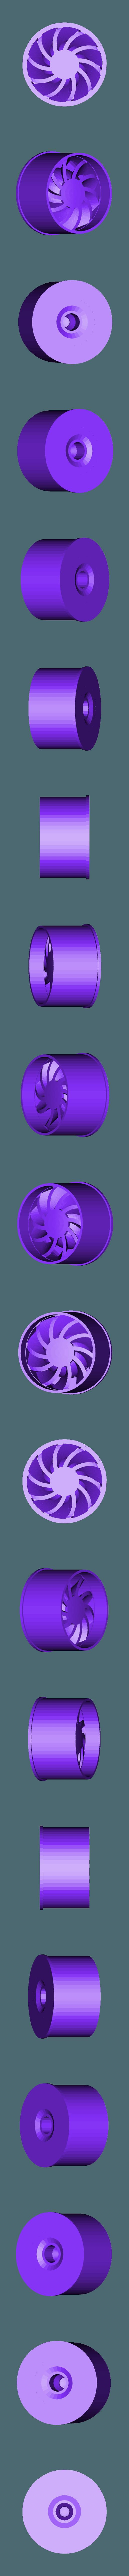 M24_Inside.stl Download free STL file Turbine Faucet Watersaver • 3D printable template, madsoul666